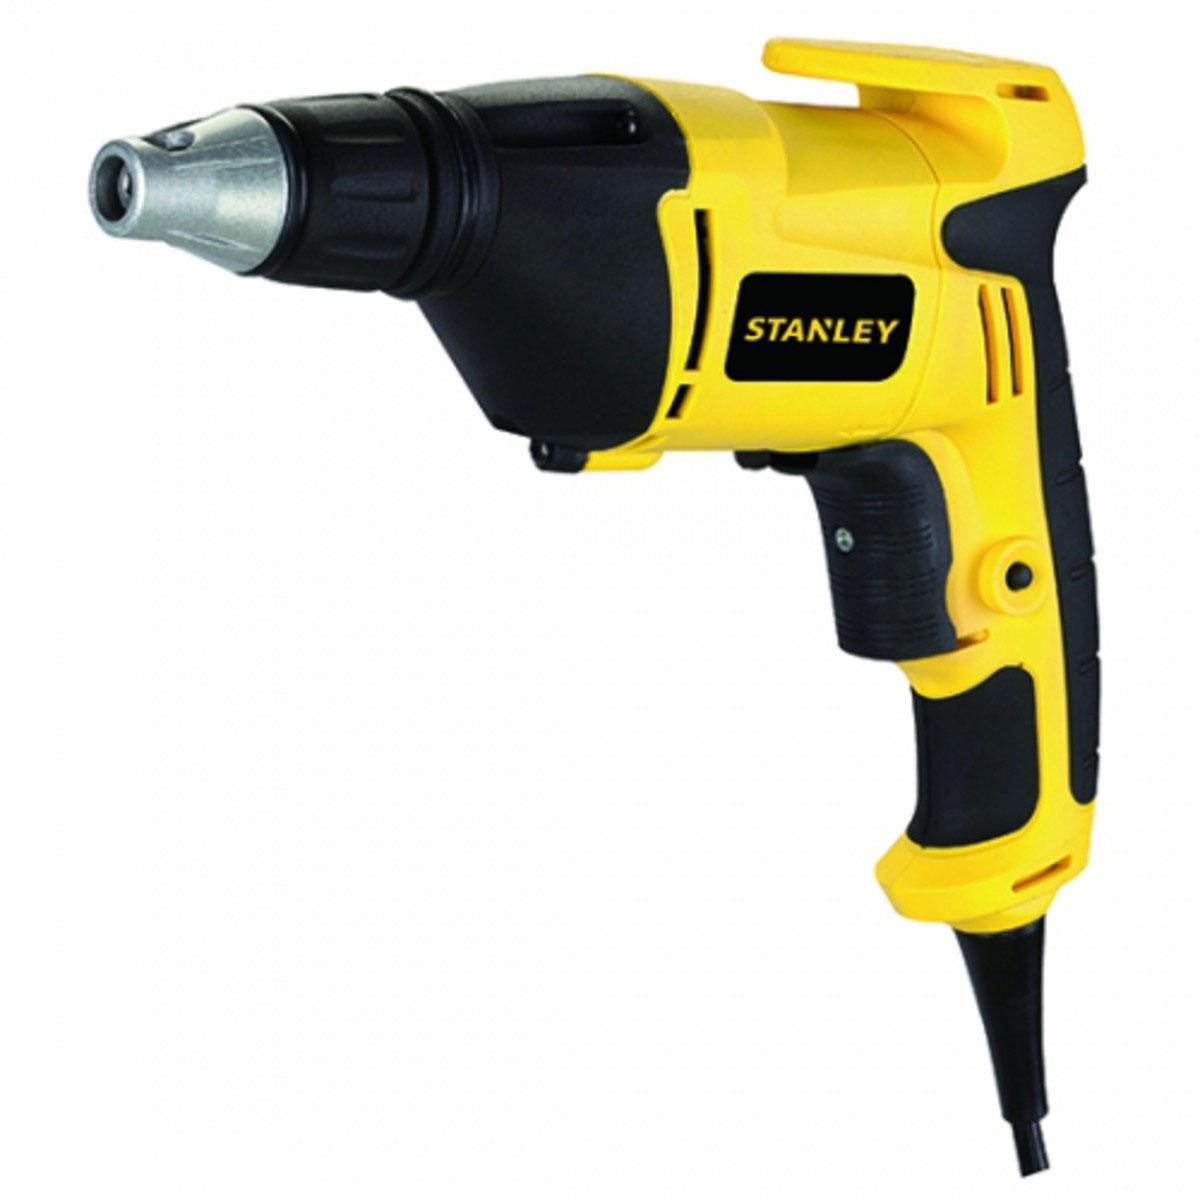 Stanley STDR5206-RU - электрический шуруповерт (Yellow)